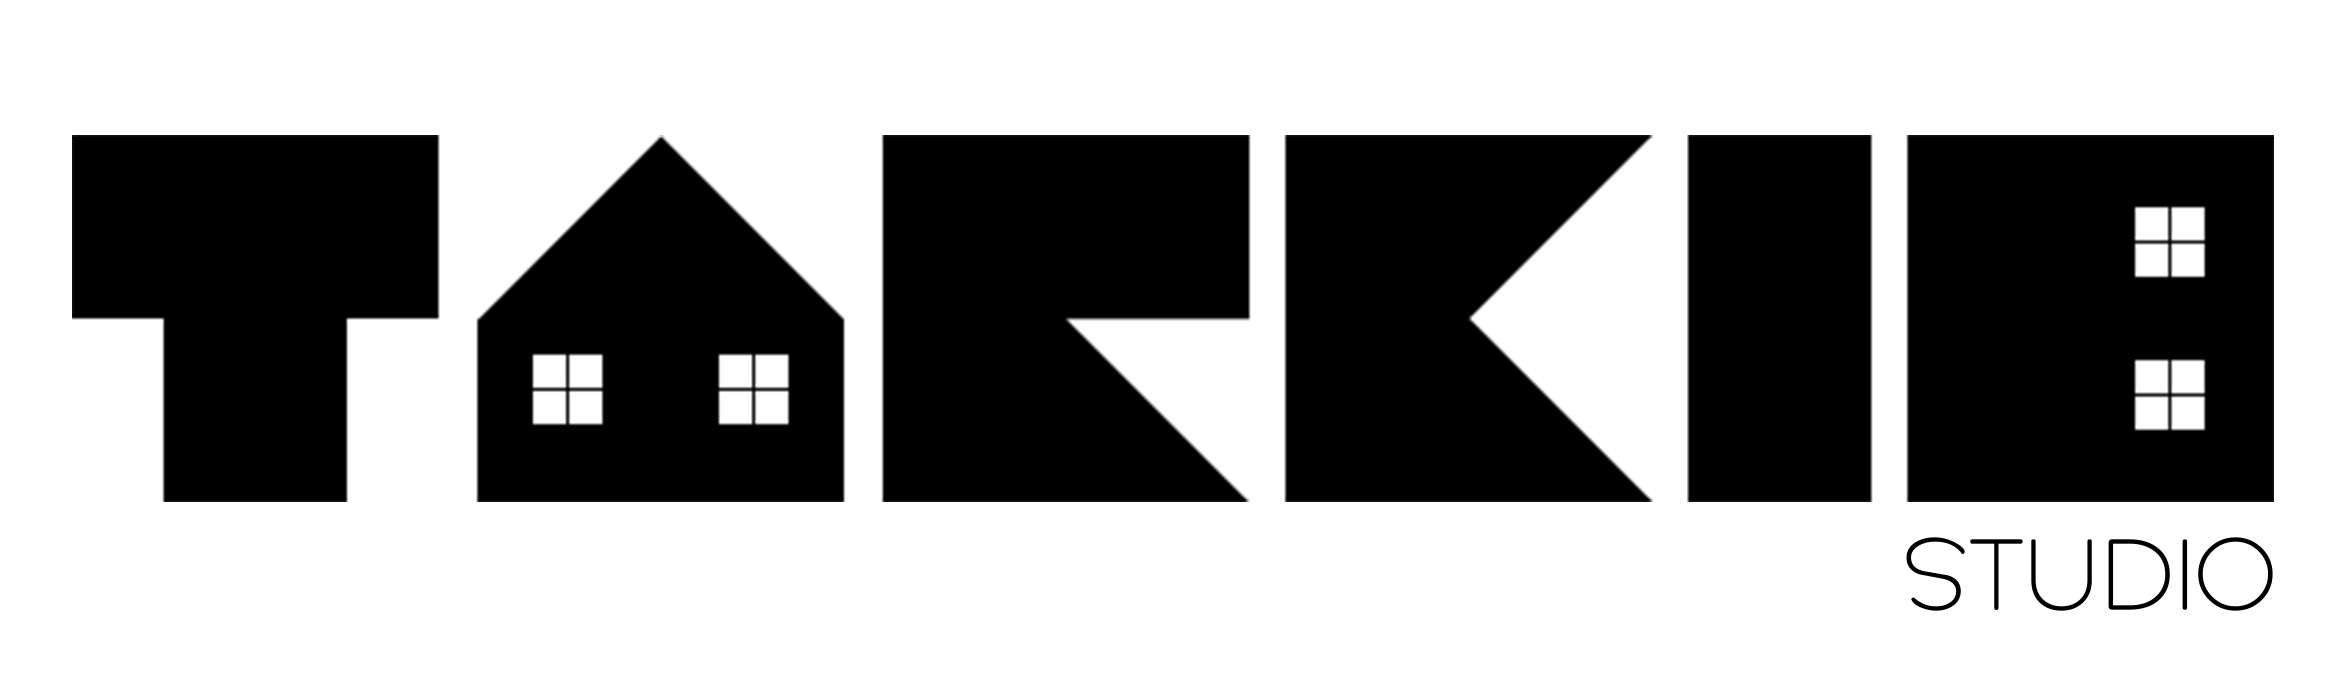 Tarkibstudio Logo